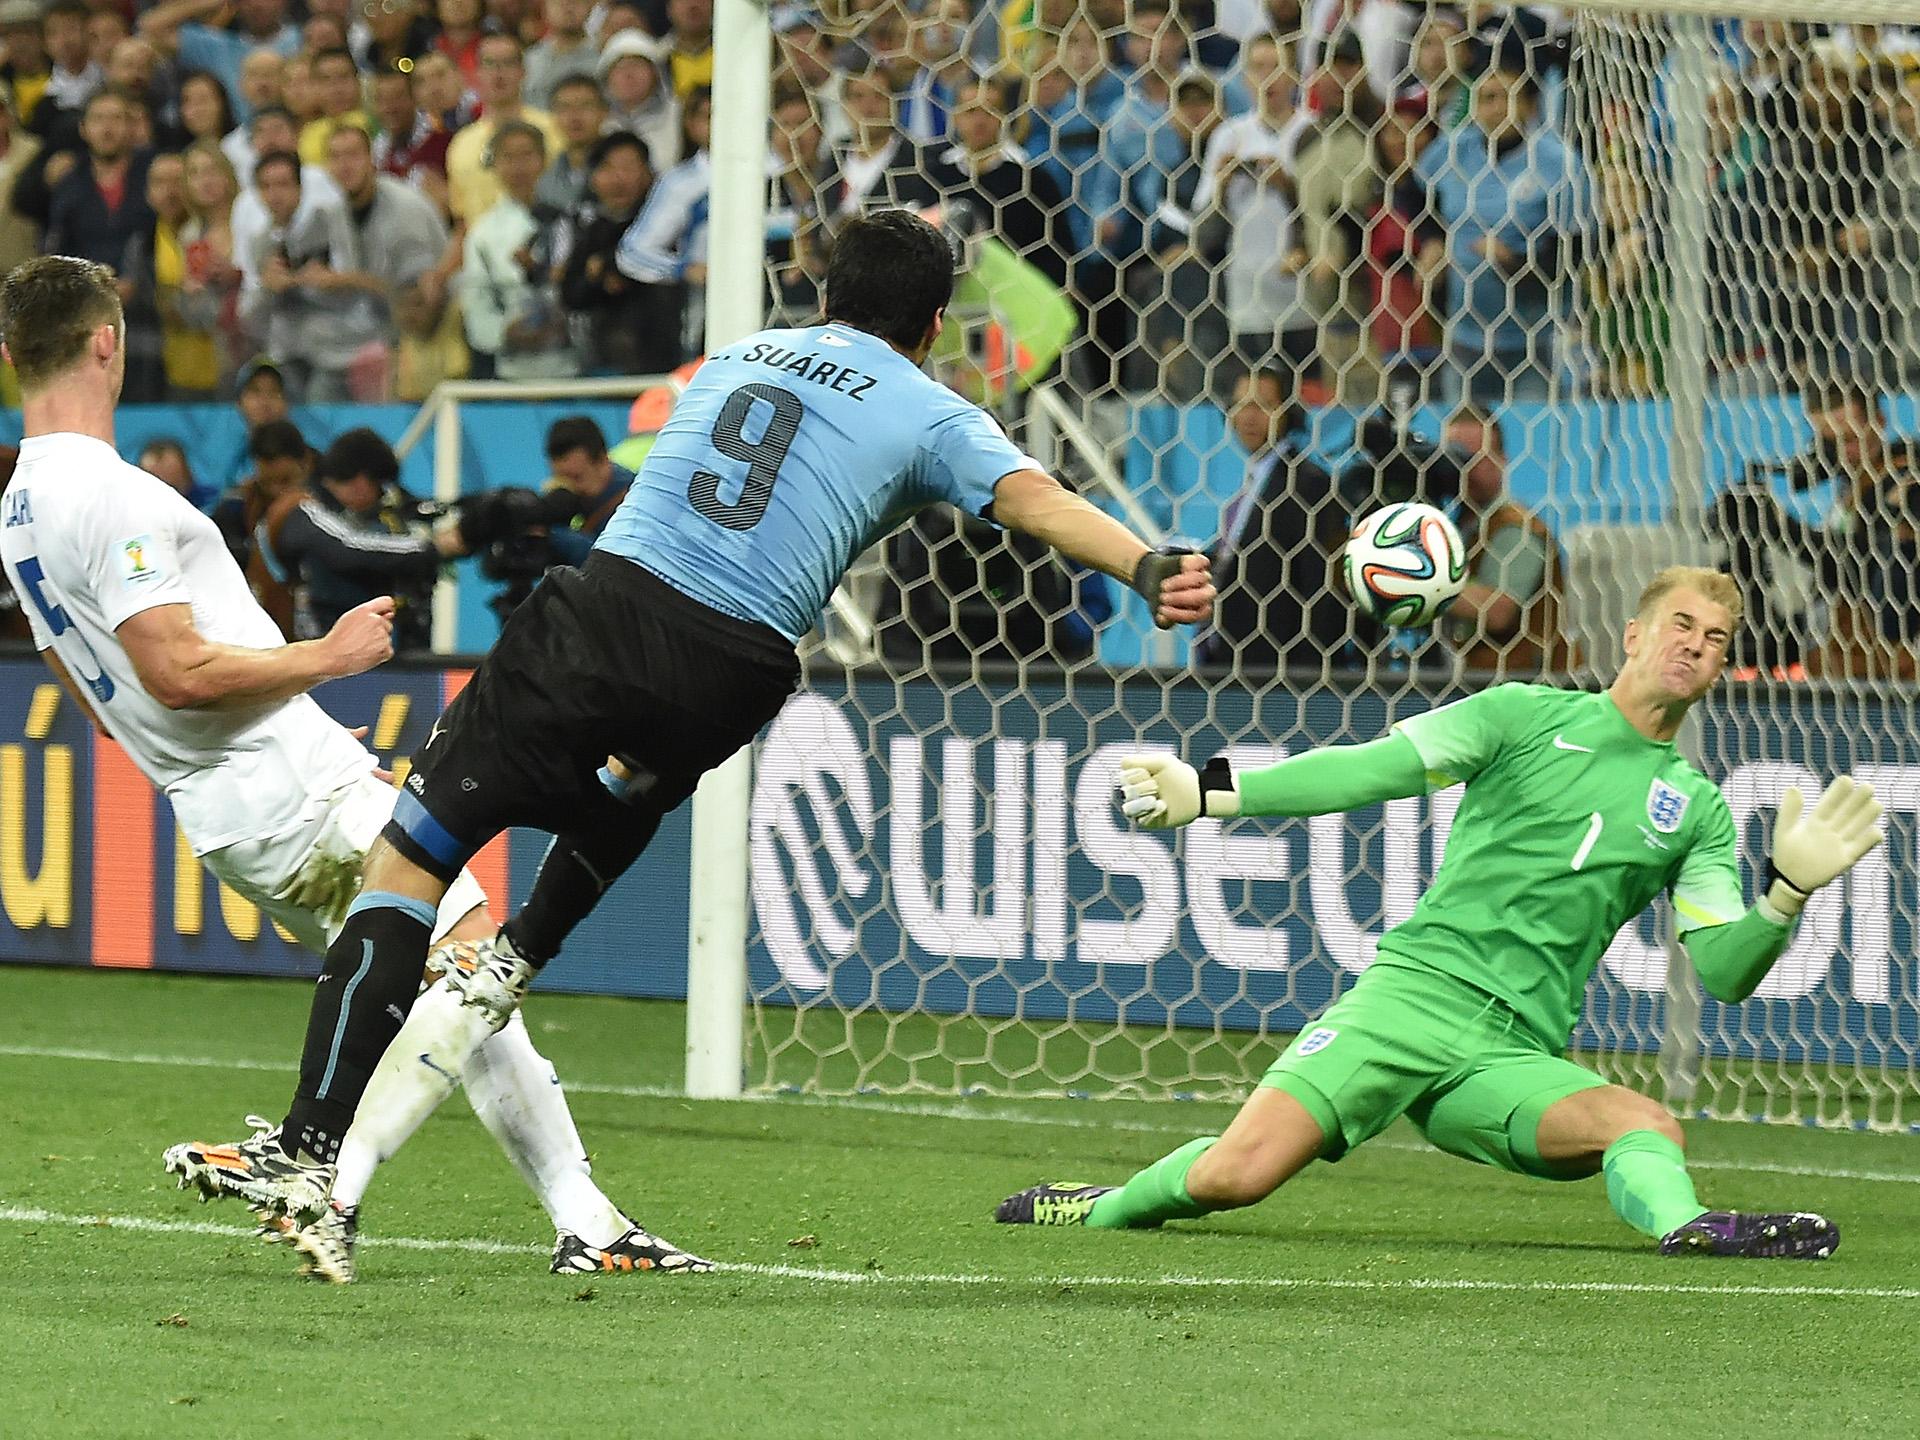 Luis Suárez Uruguay England 2014 World Cup Group D 06192014